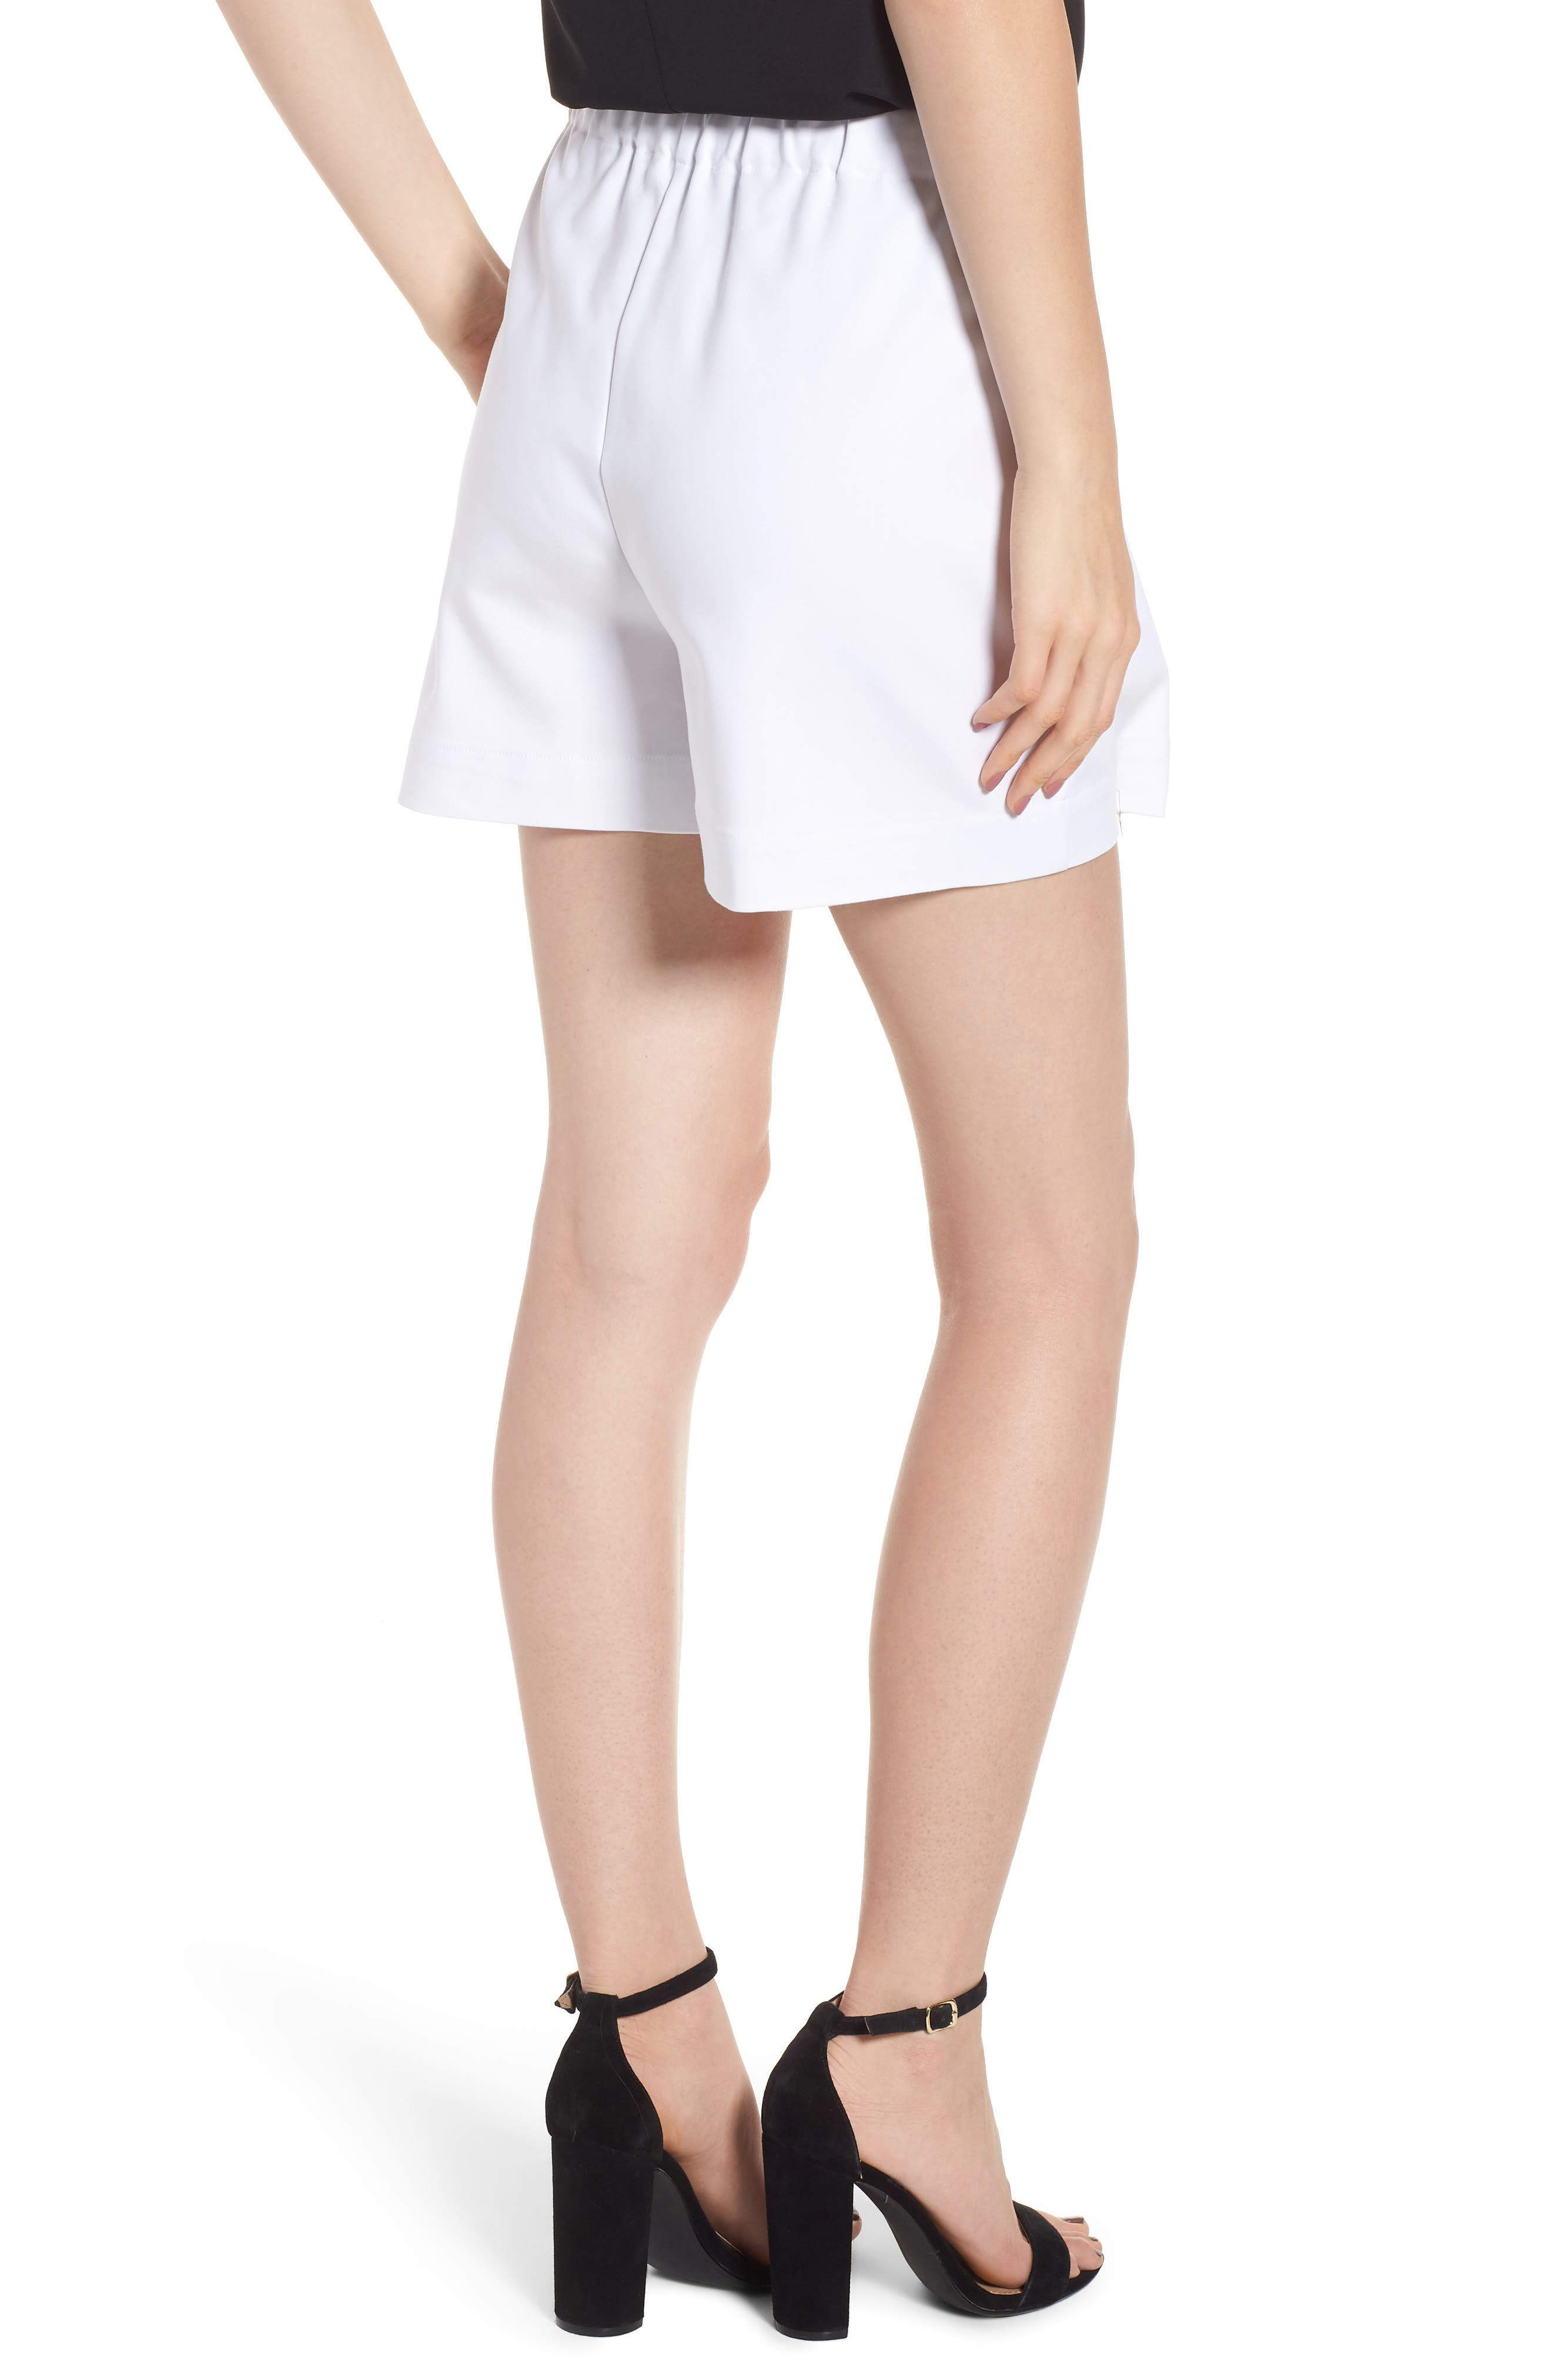 Park South Shorts,                             Alternate thumbnail 2, color,                             White